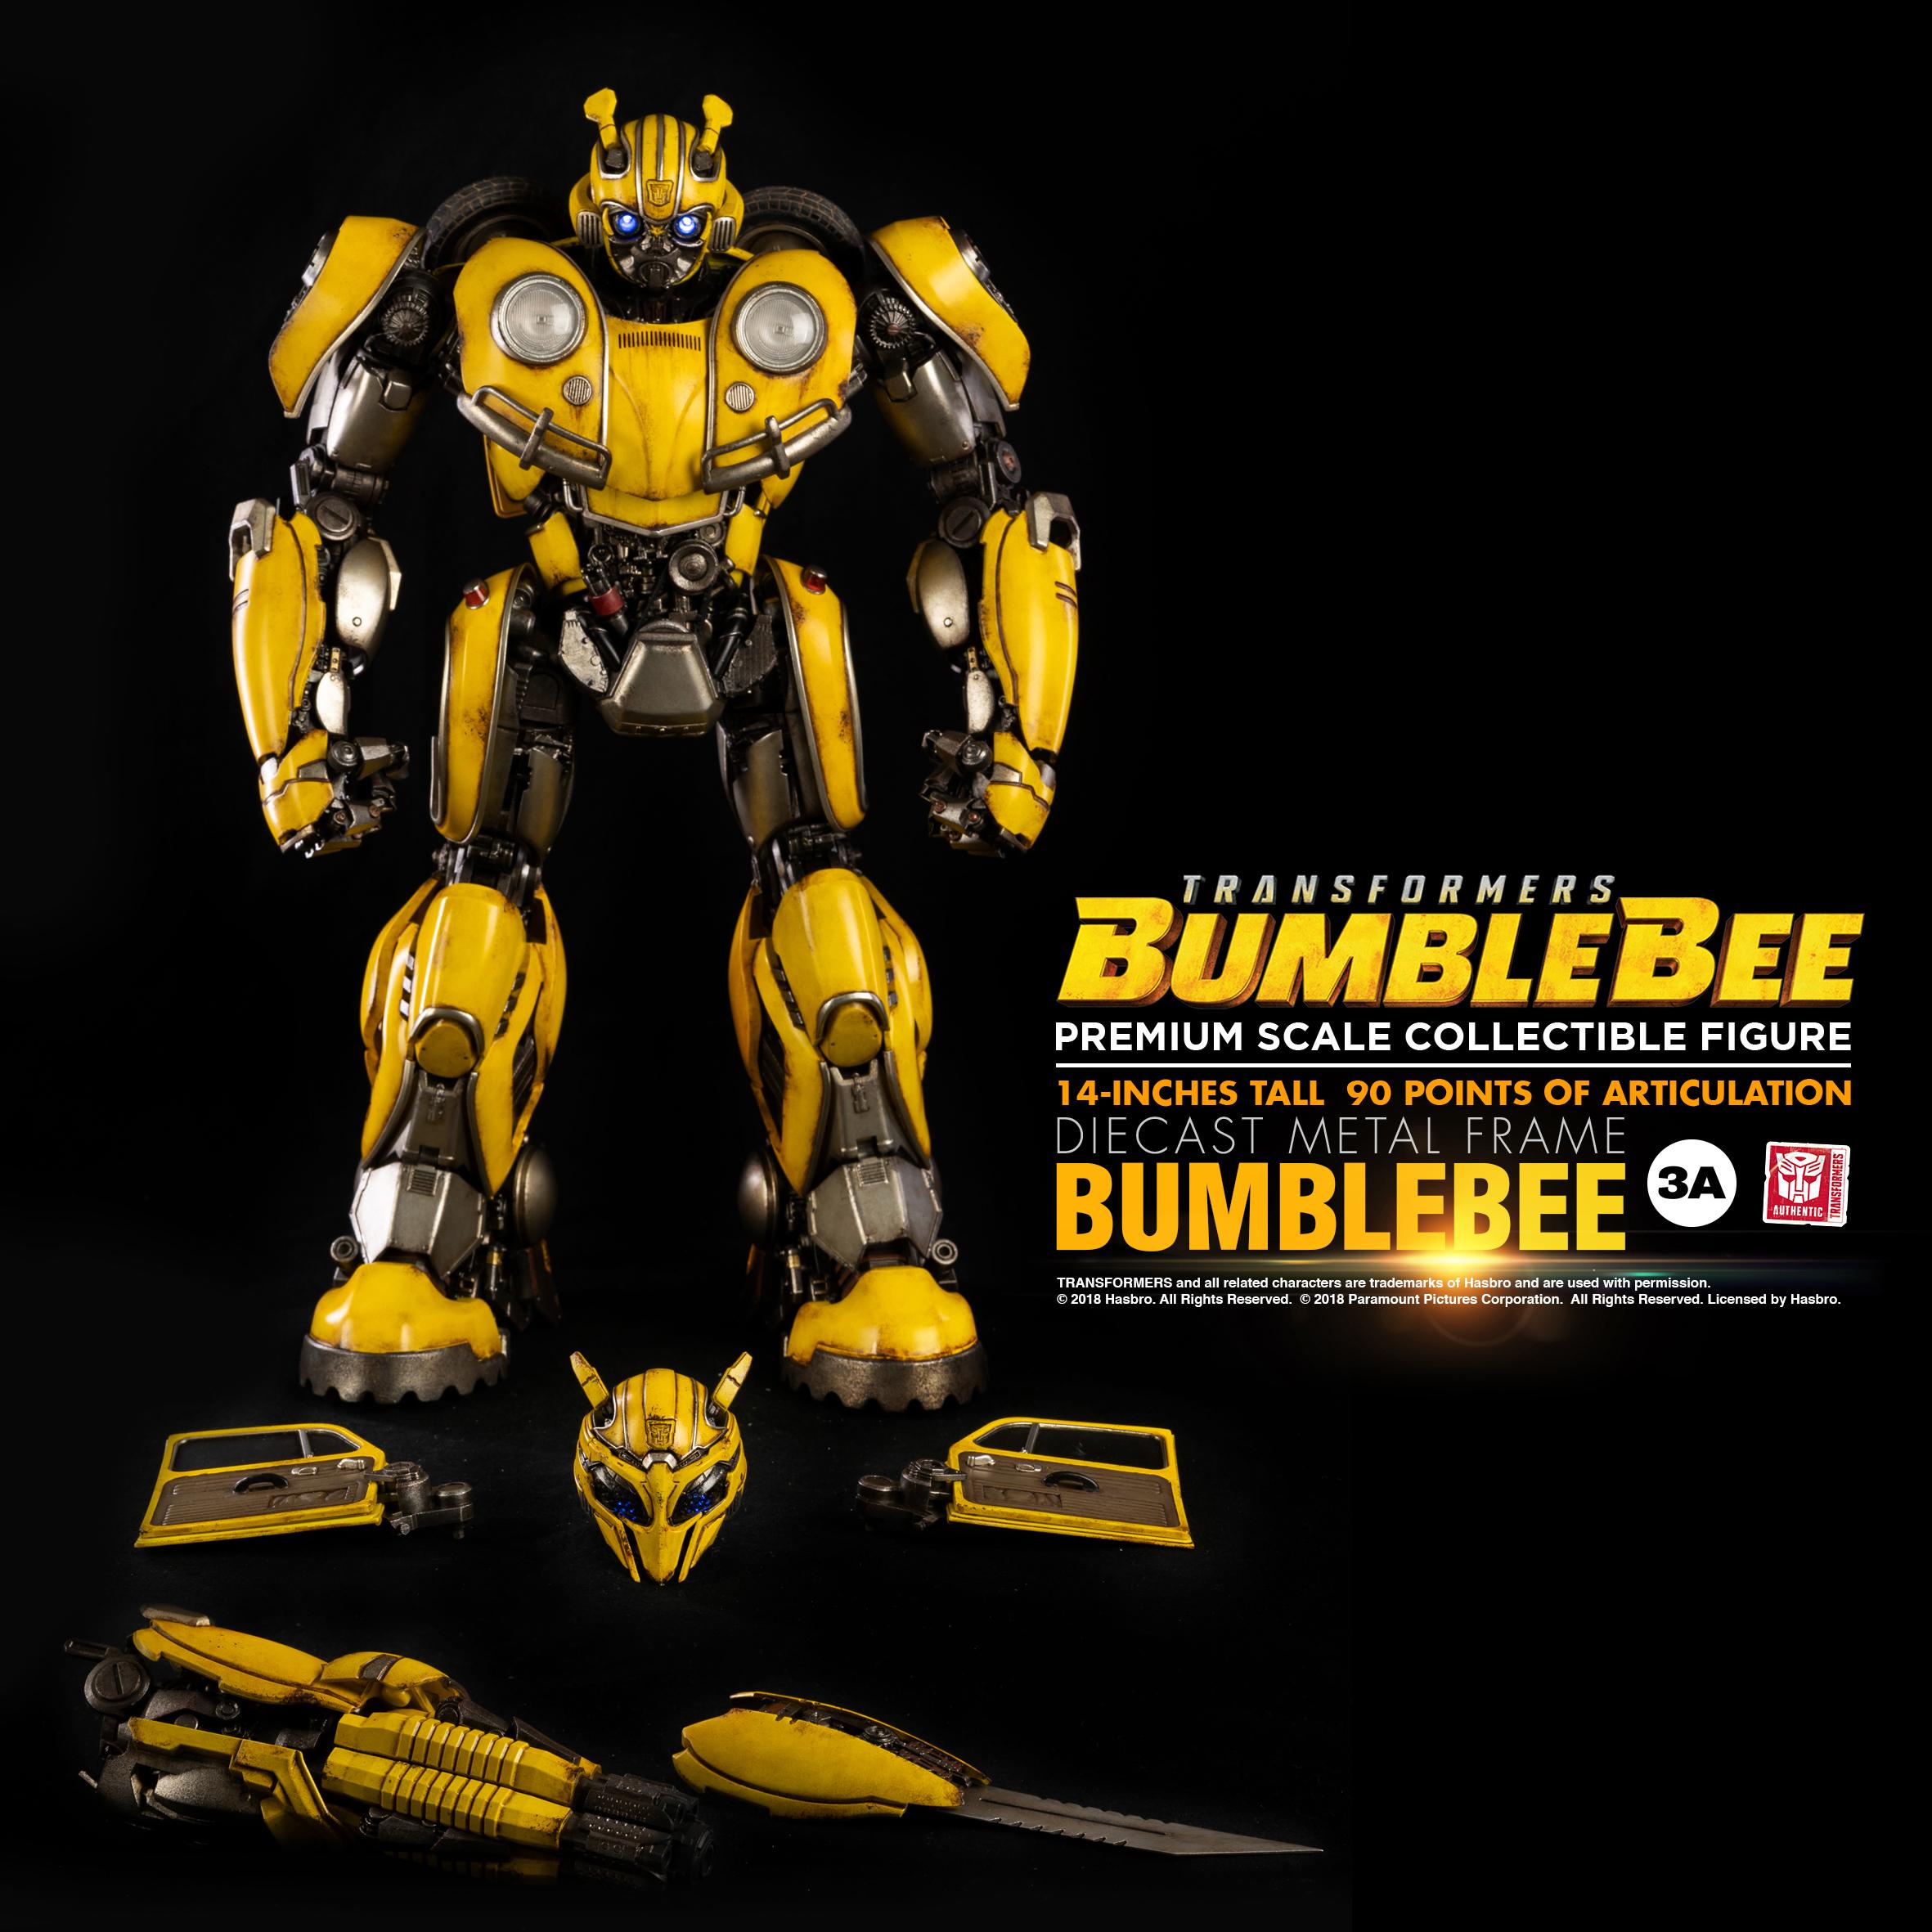 Bumblebee_ENG_PM_SQUARE_013.jpg